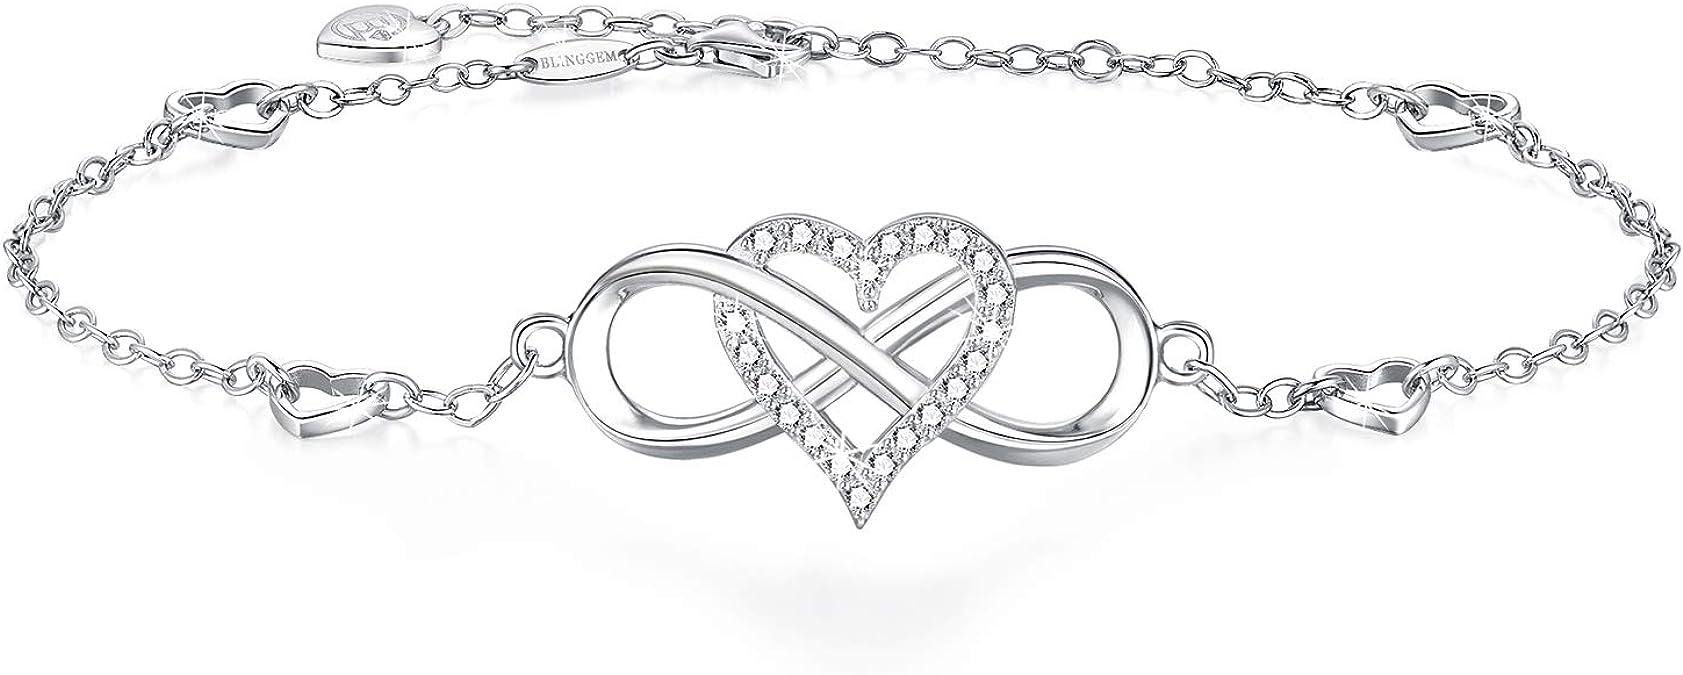 gift for her Sterling Silver Anklet handmade Boho Anklet Ankle Bracelet Ankle Chain Star Charm Anklet bridesmaid gift Star Anklet